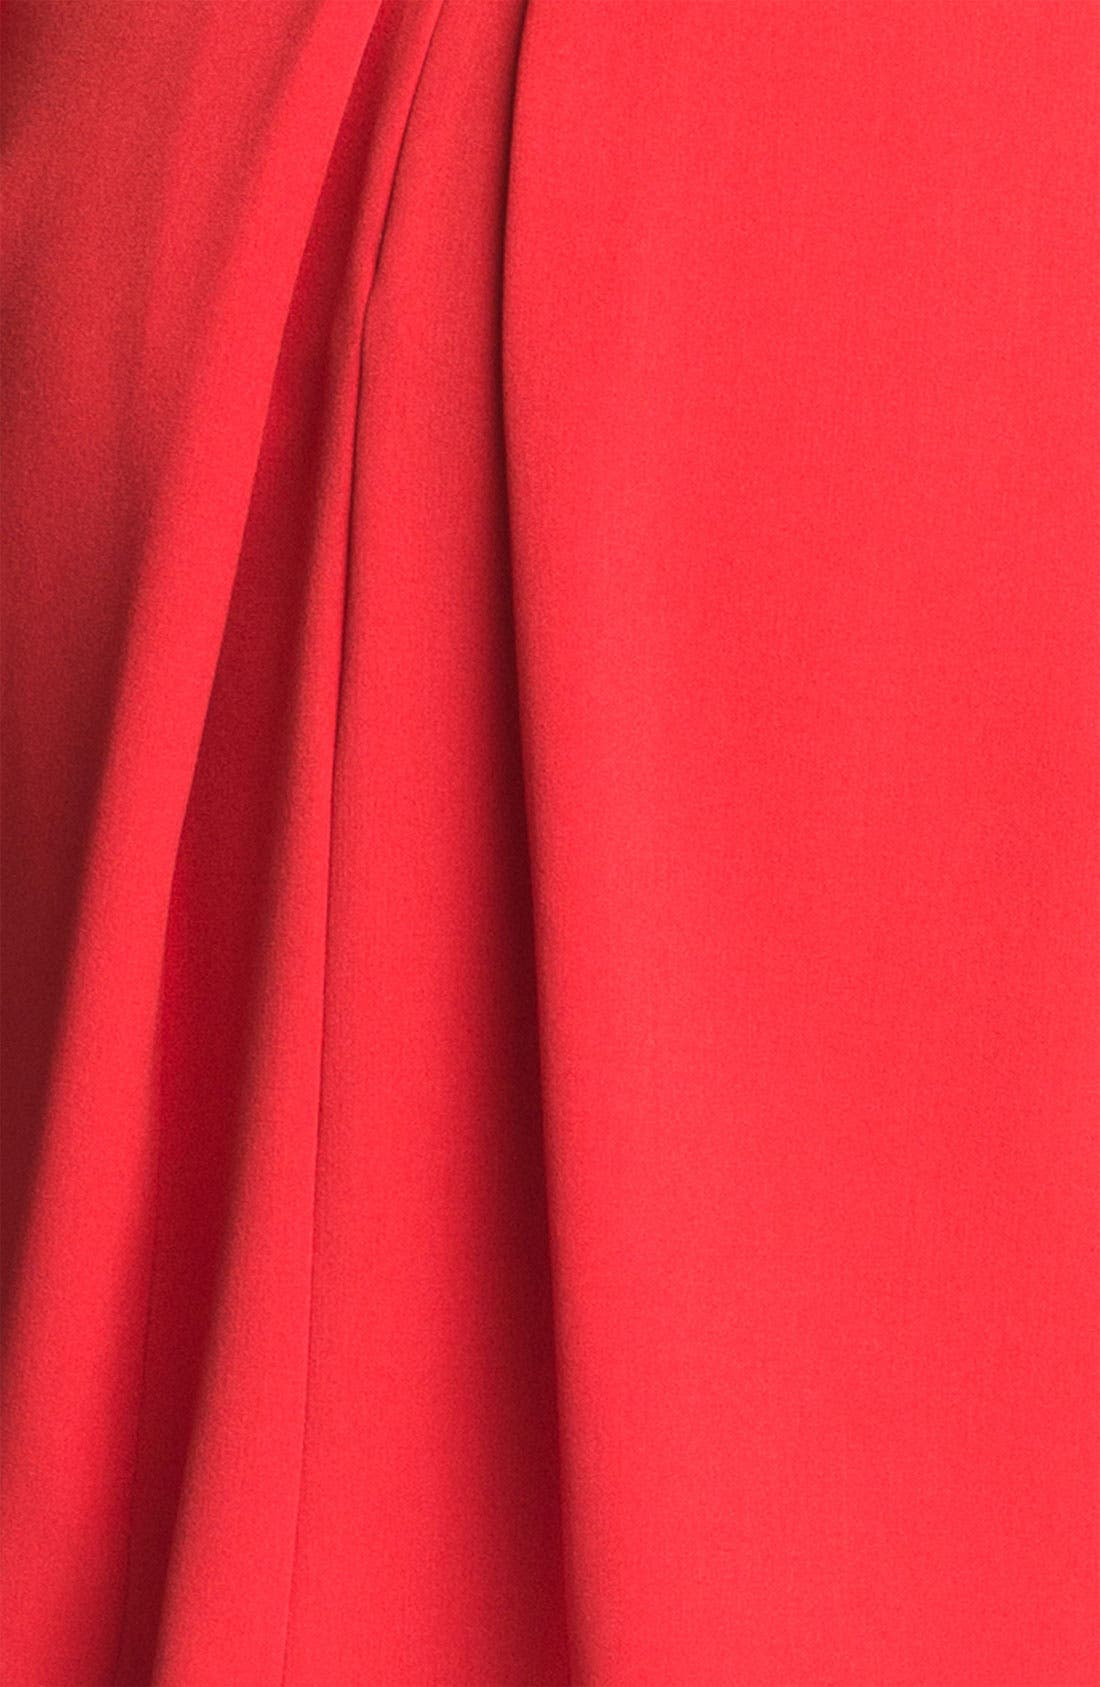 Belted A-Line Dress,                             Alternate thumbnail 2, color,                             600